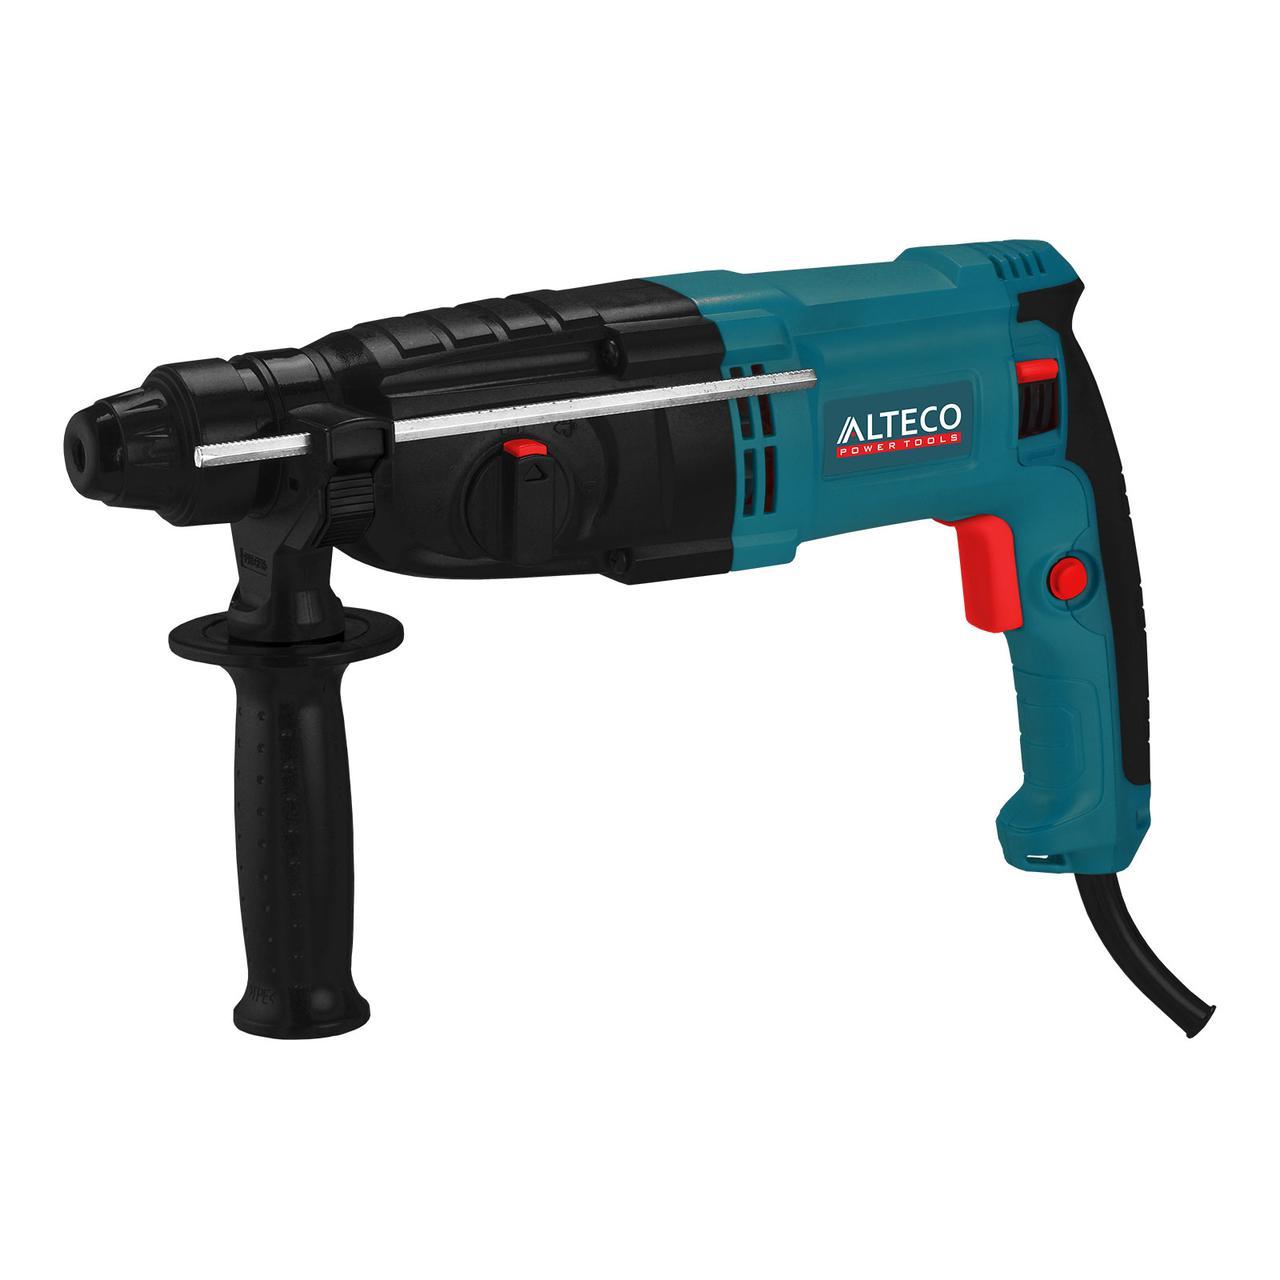 ALTECO RH 950-26 SDS-Plus Перфоратор